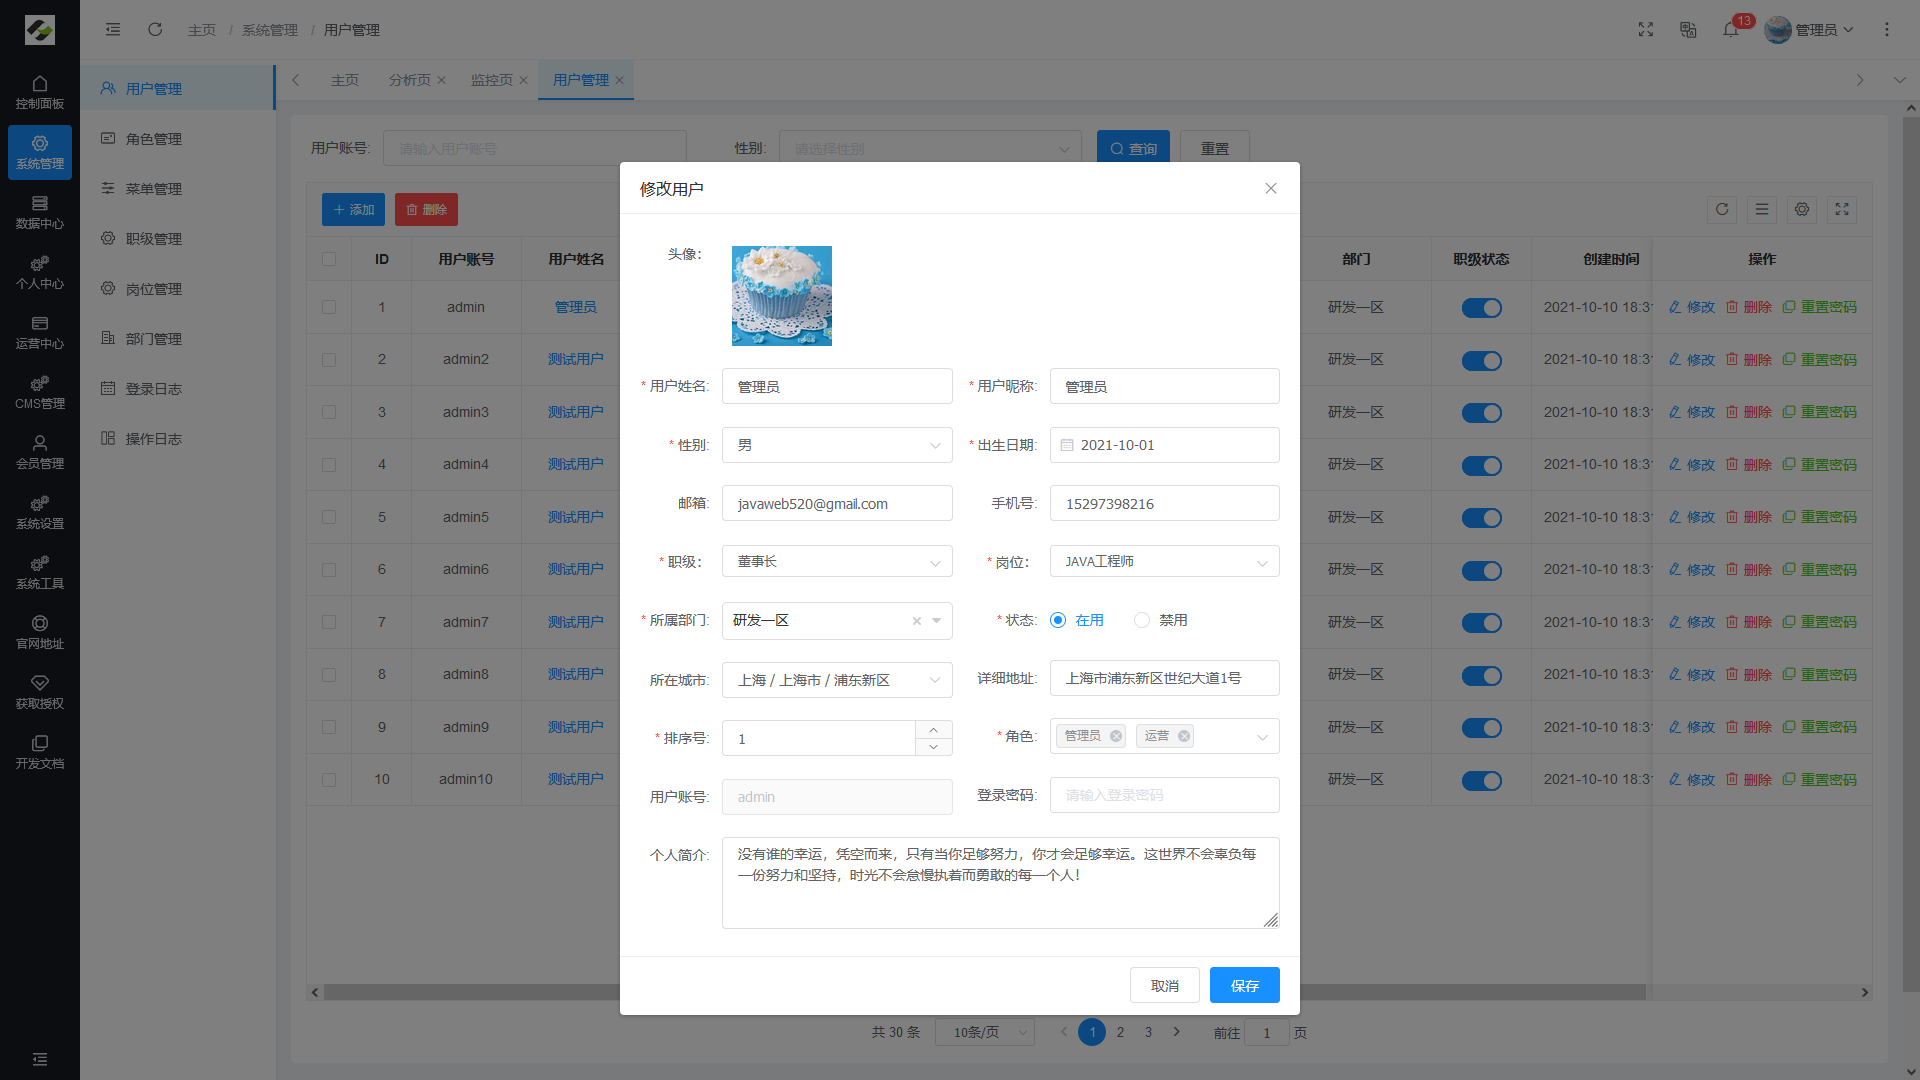 JavaWeb_Cloud_Pro 旗舰版 v2.0.0 发布,框架新版本重构